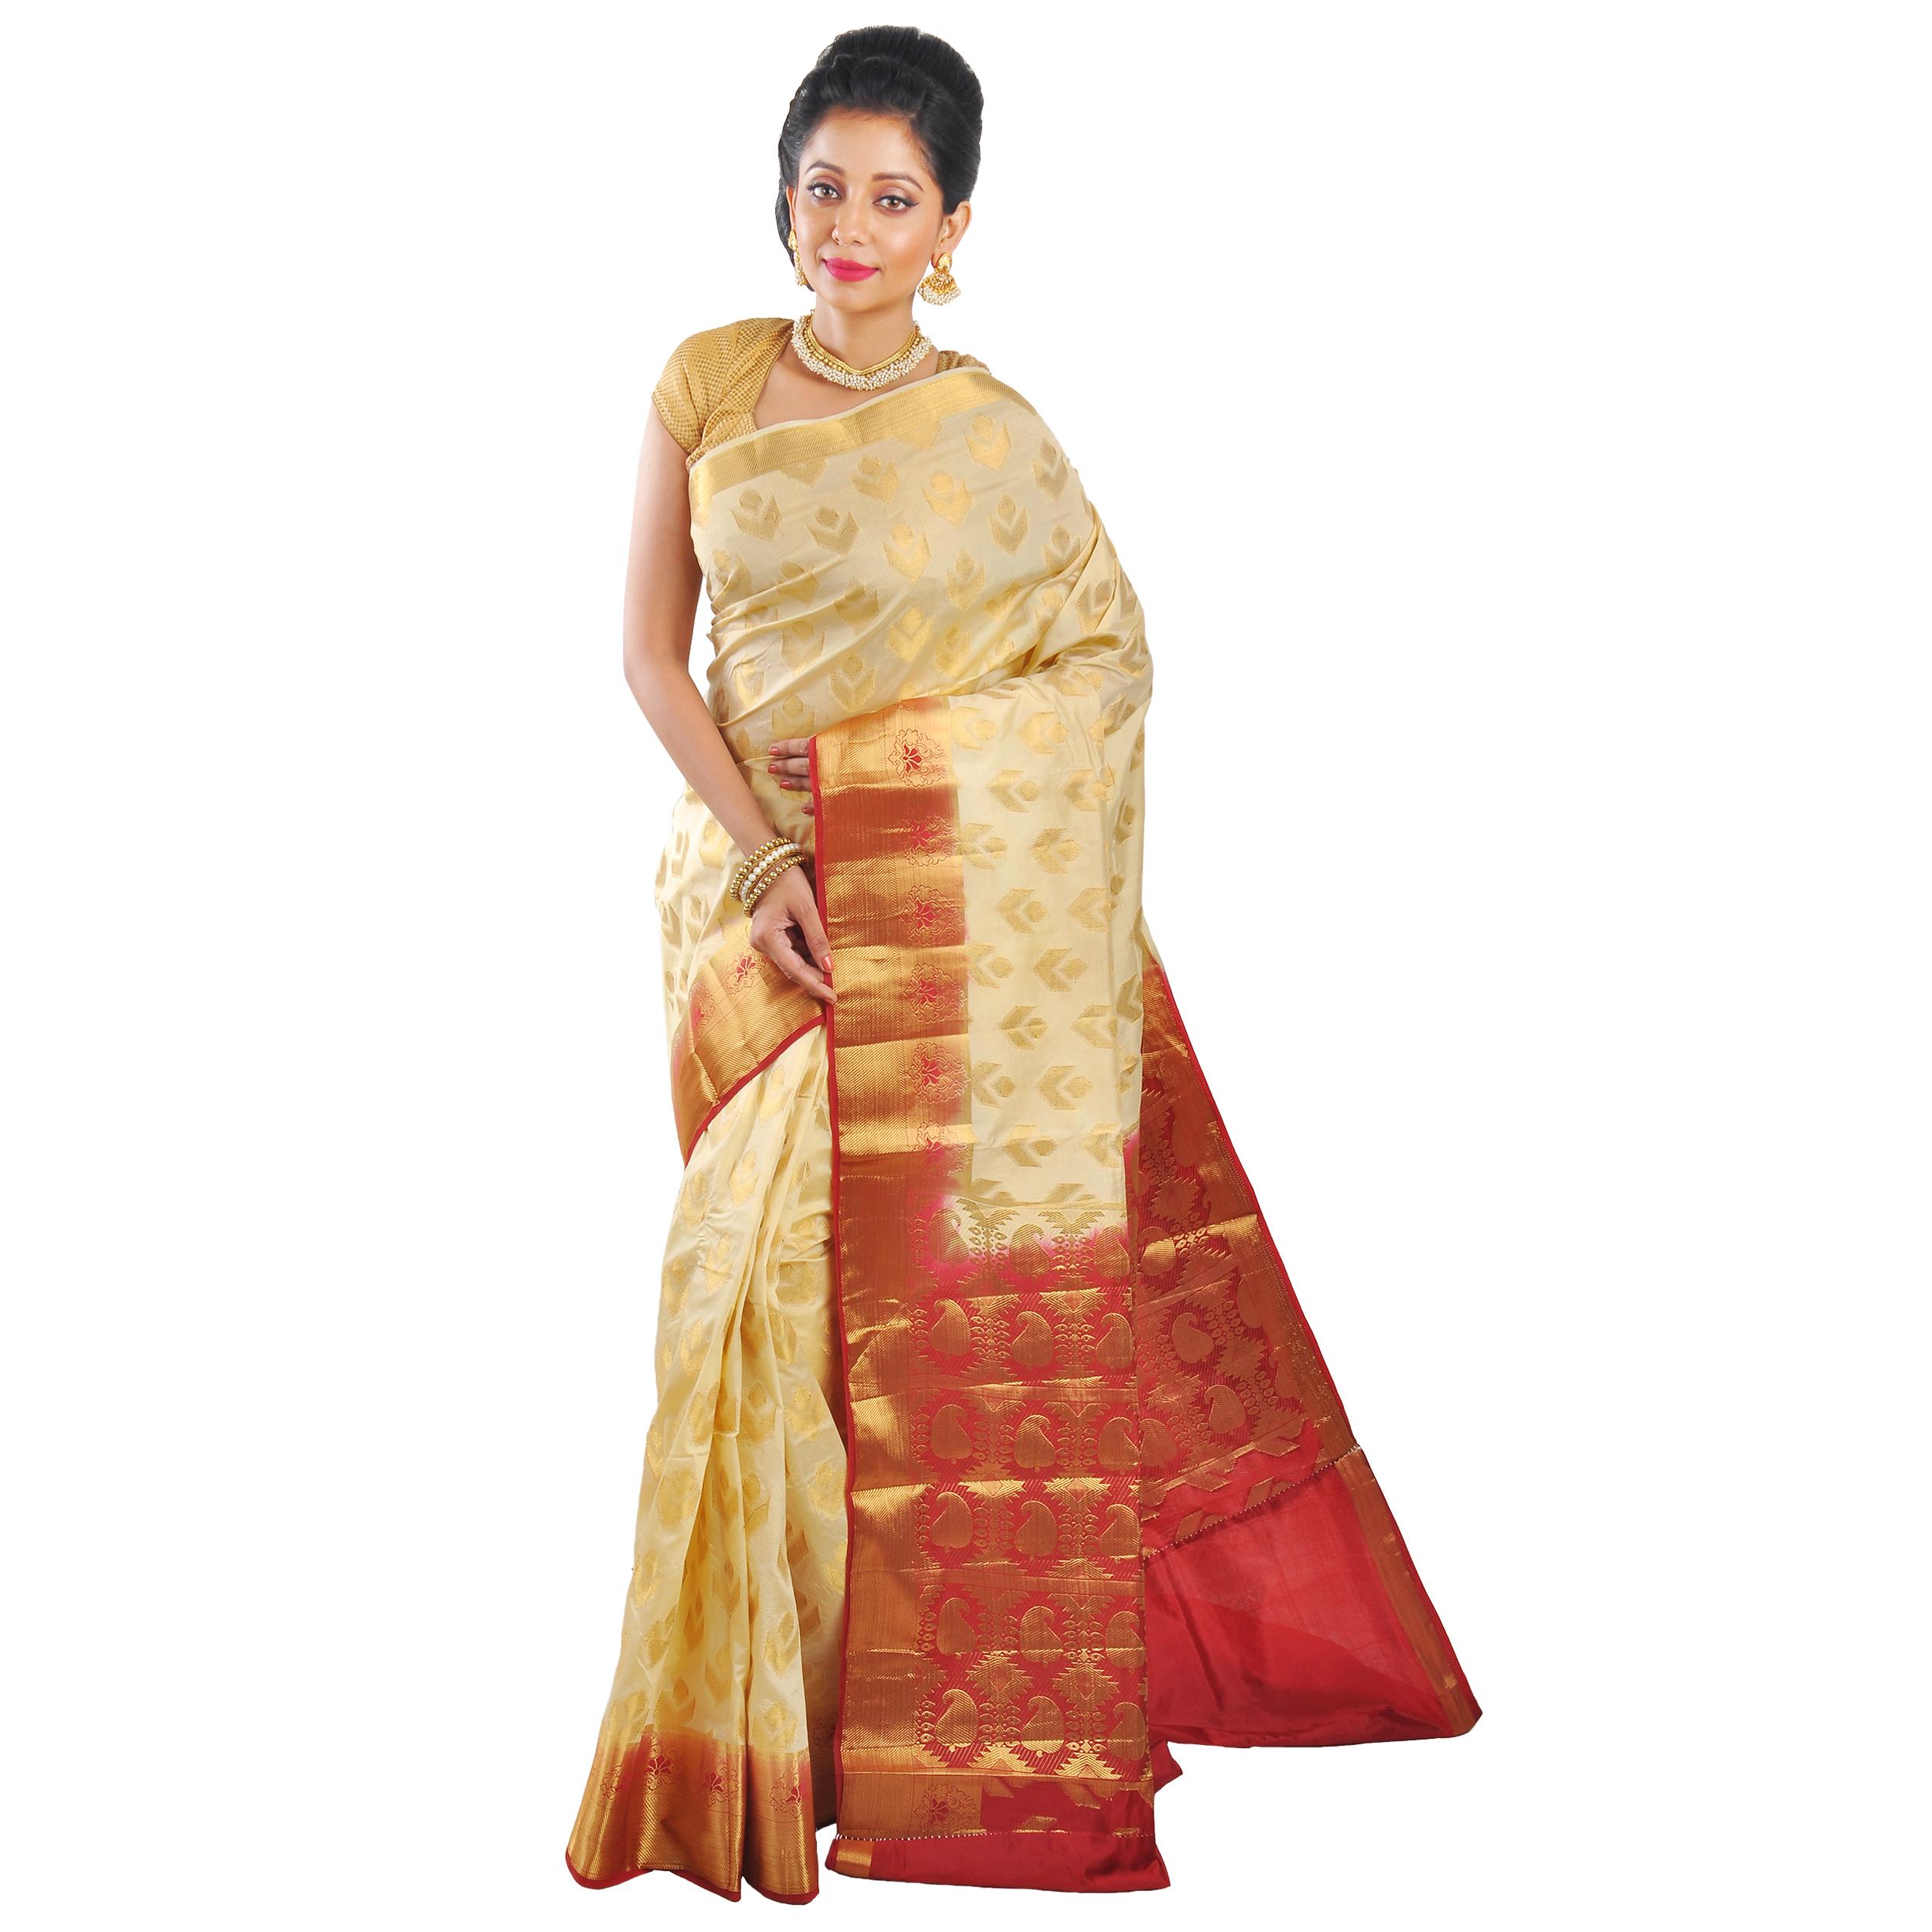 6c7a4e409d Off white woven art silk saree with blouse - Aayori - 2555739